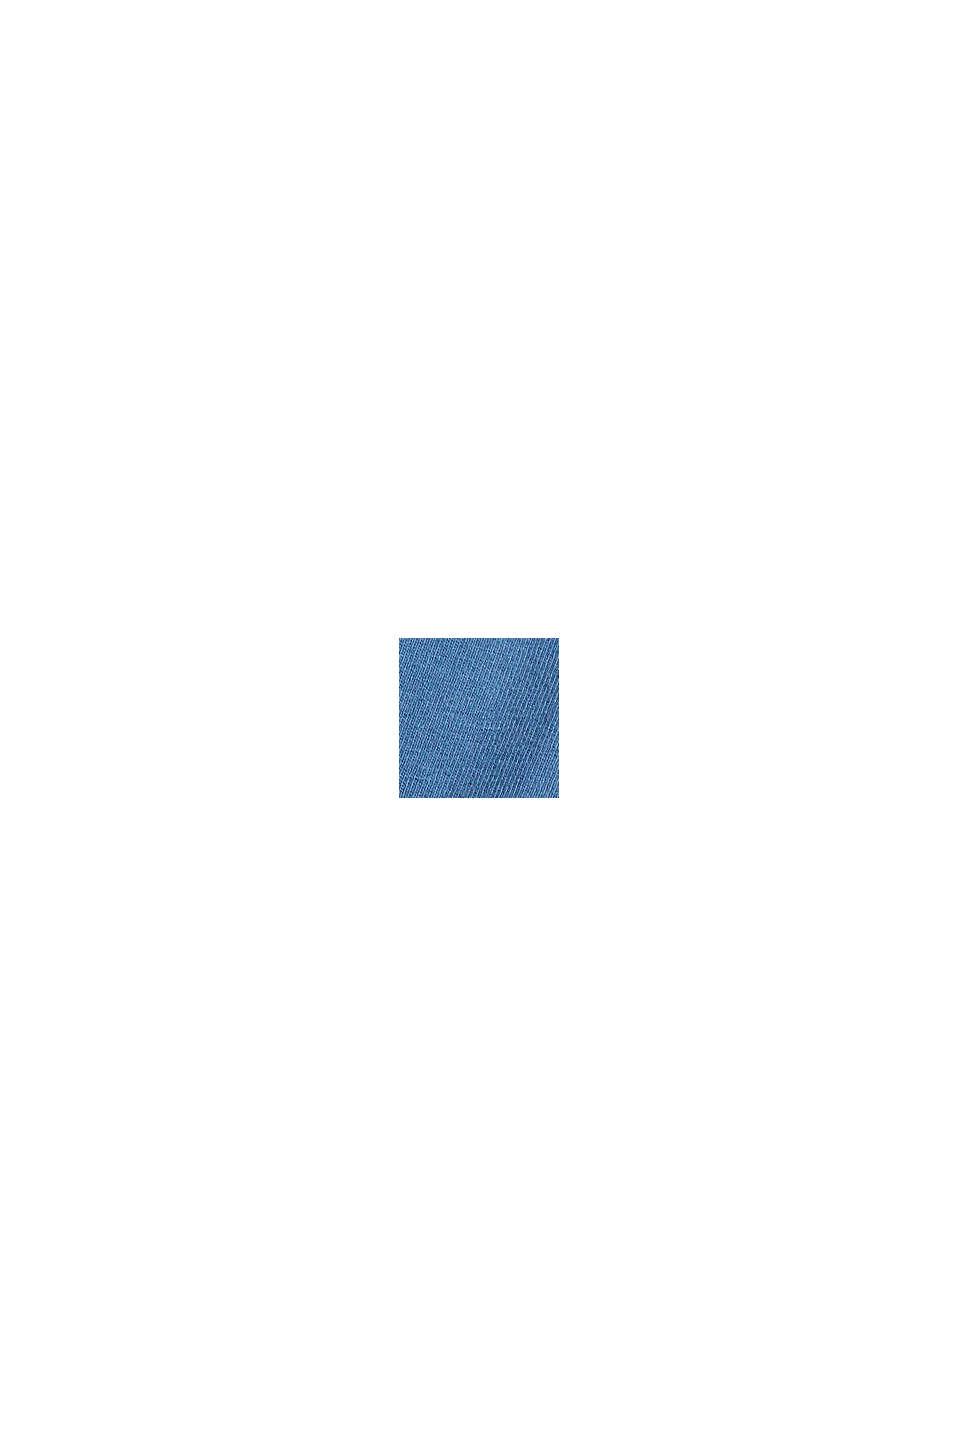 T-Shirts Slim Fit, BLUE, swatch